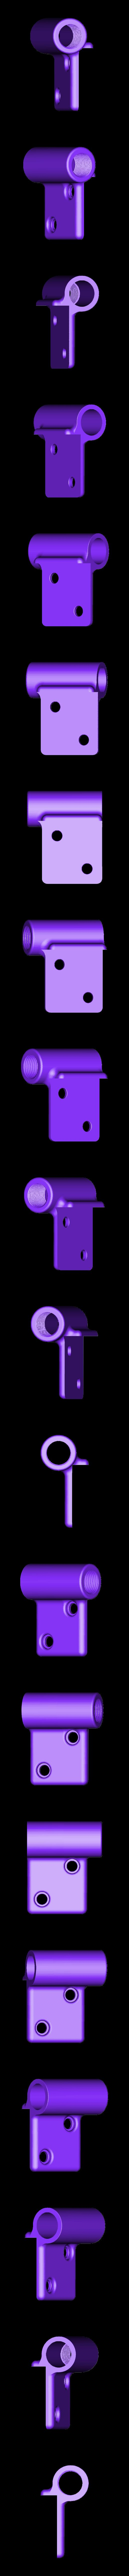 fixation ender.stl Download STL file Articulated support camera , photo , video , creality ender 3 standard screws photo • 3D printable template, benj2365